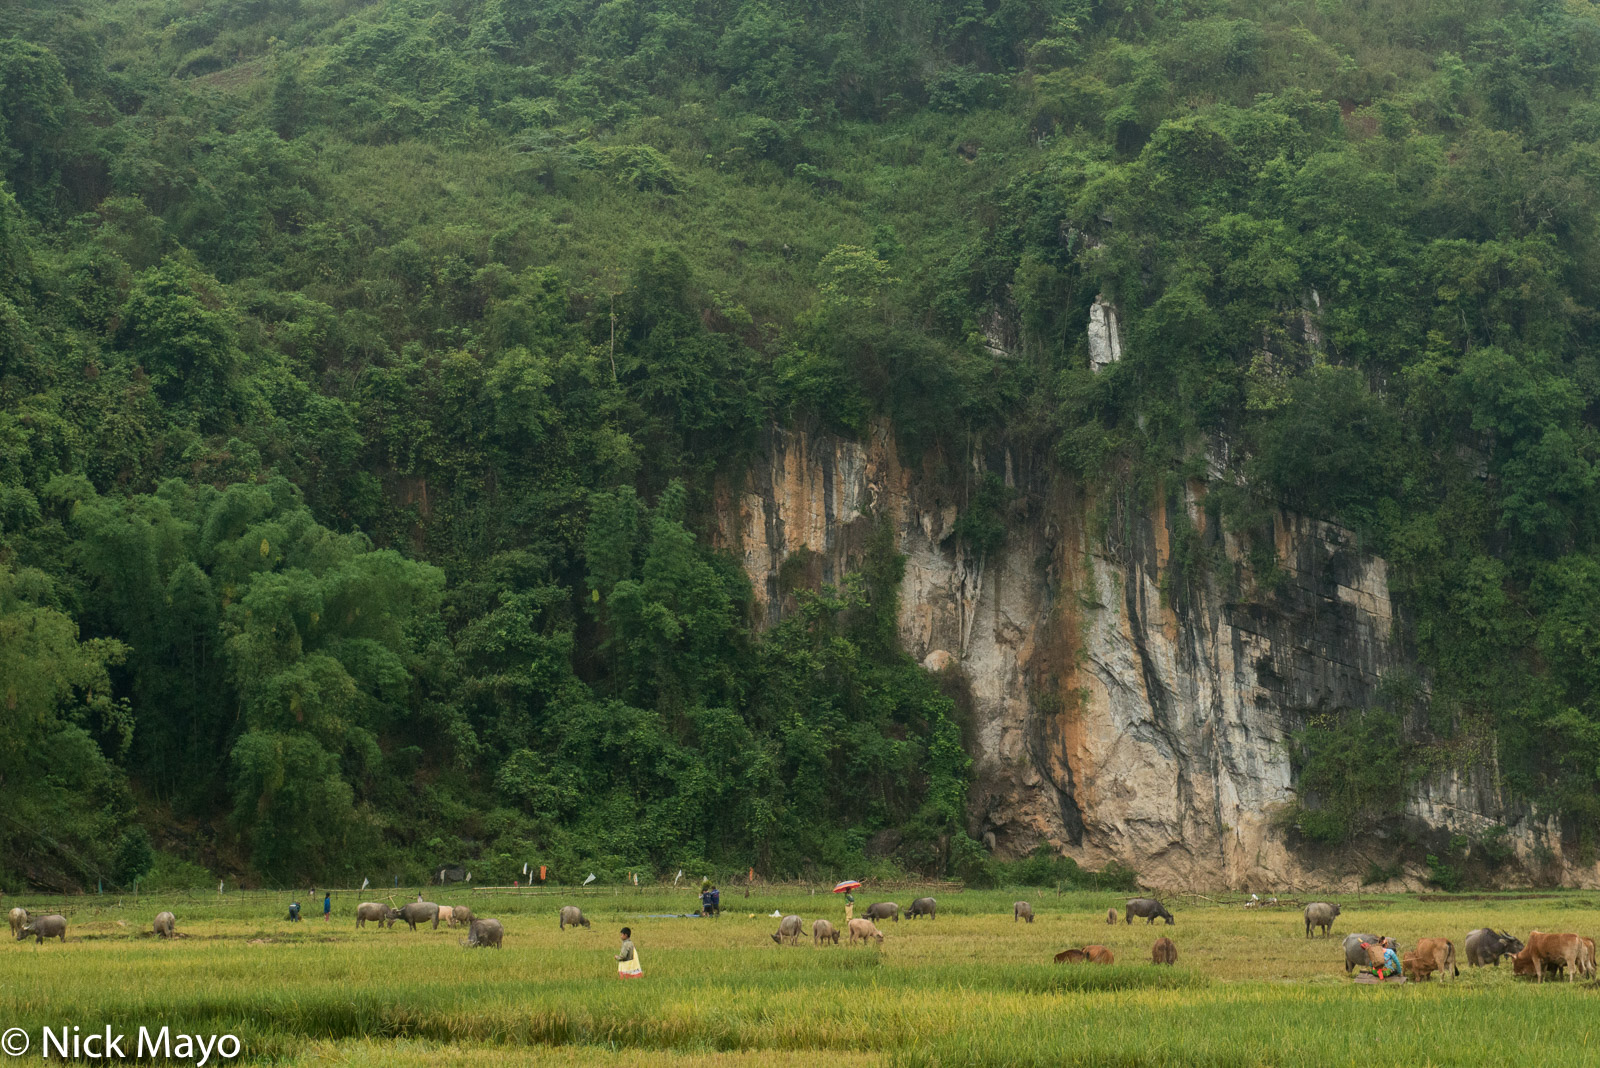 Water buffalo and cattle graze on freshly cut paddy rice fields near Tua Chua.